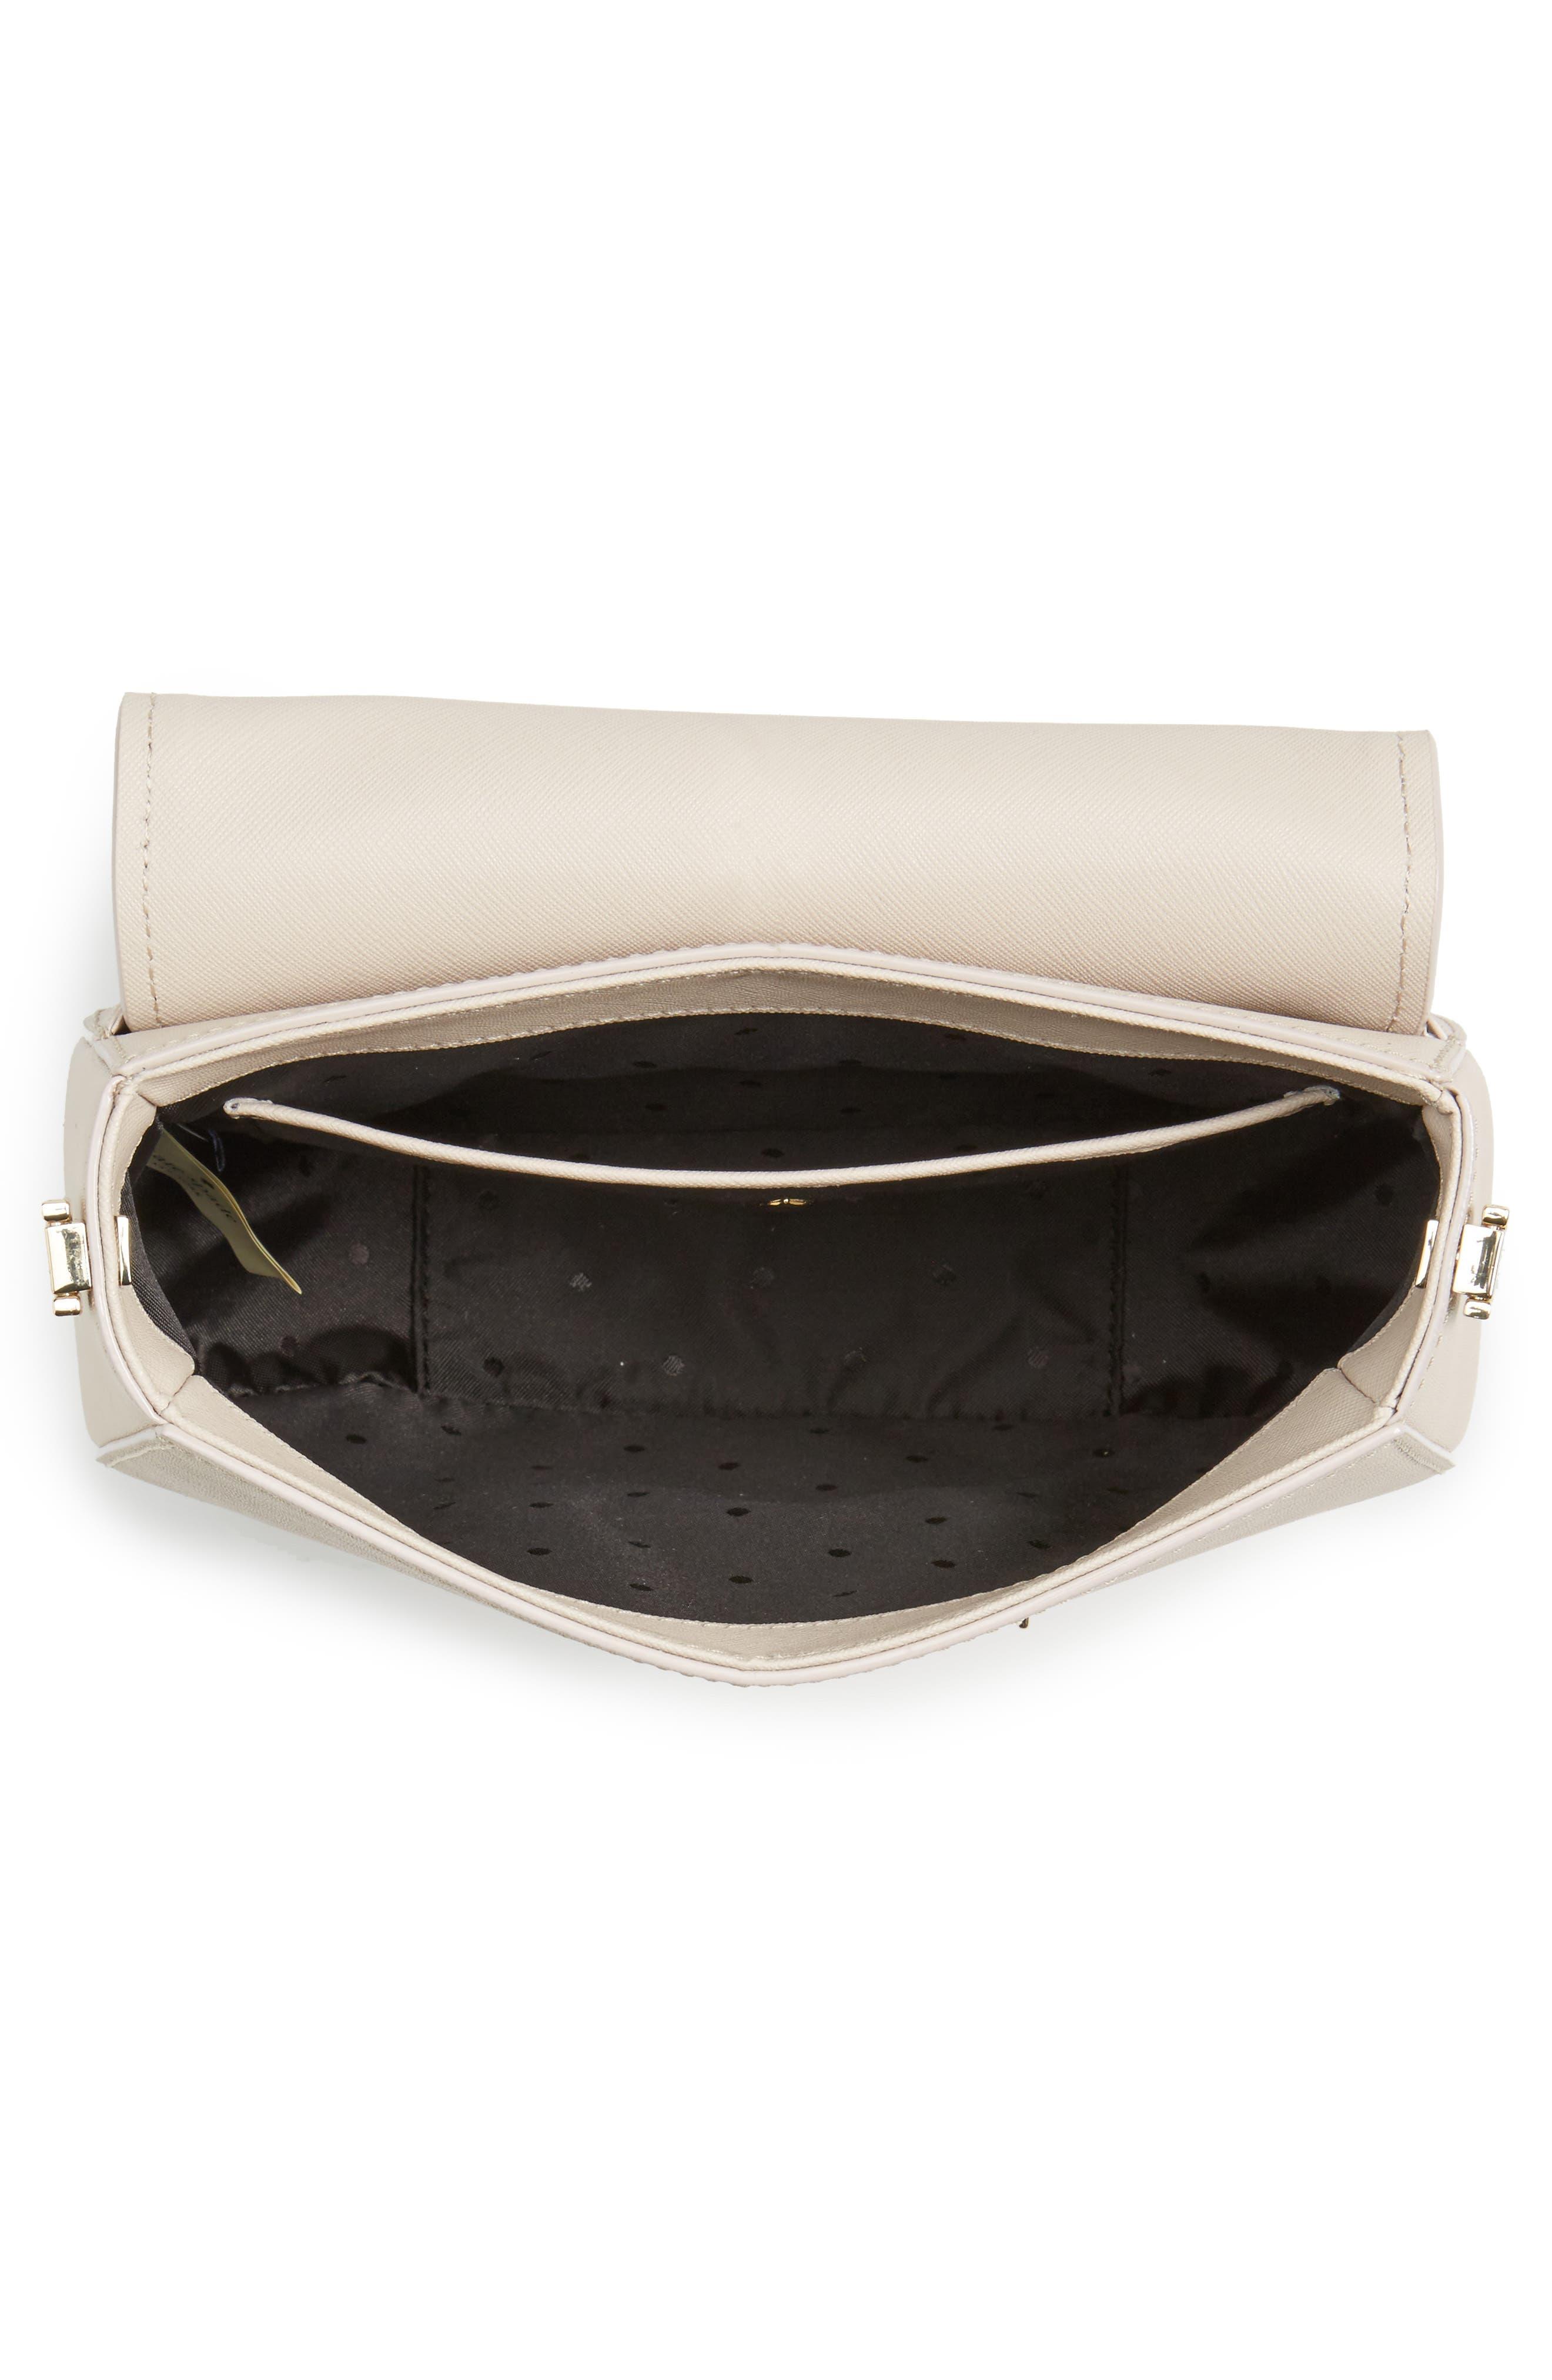 make it mine - byrdie leather saddle bag,                             Alternate thumbnail 8, color,